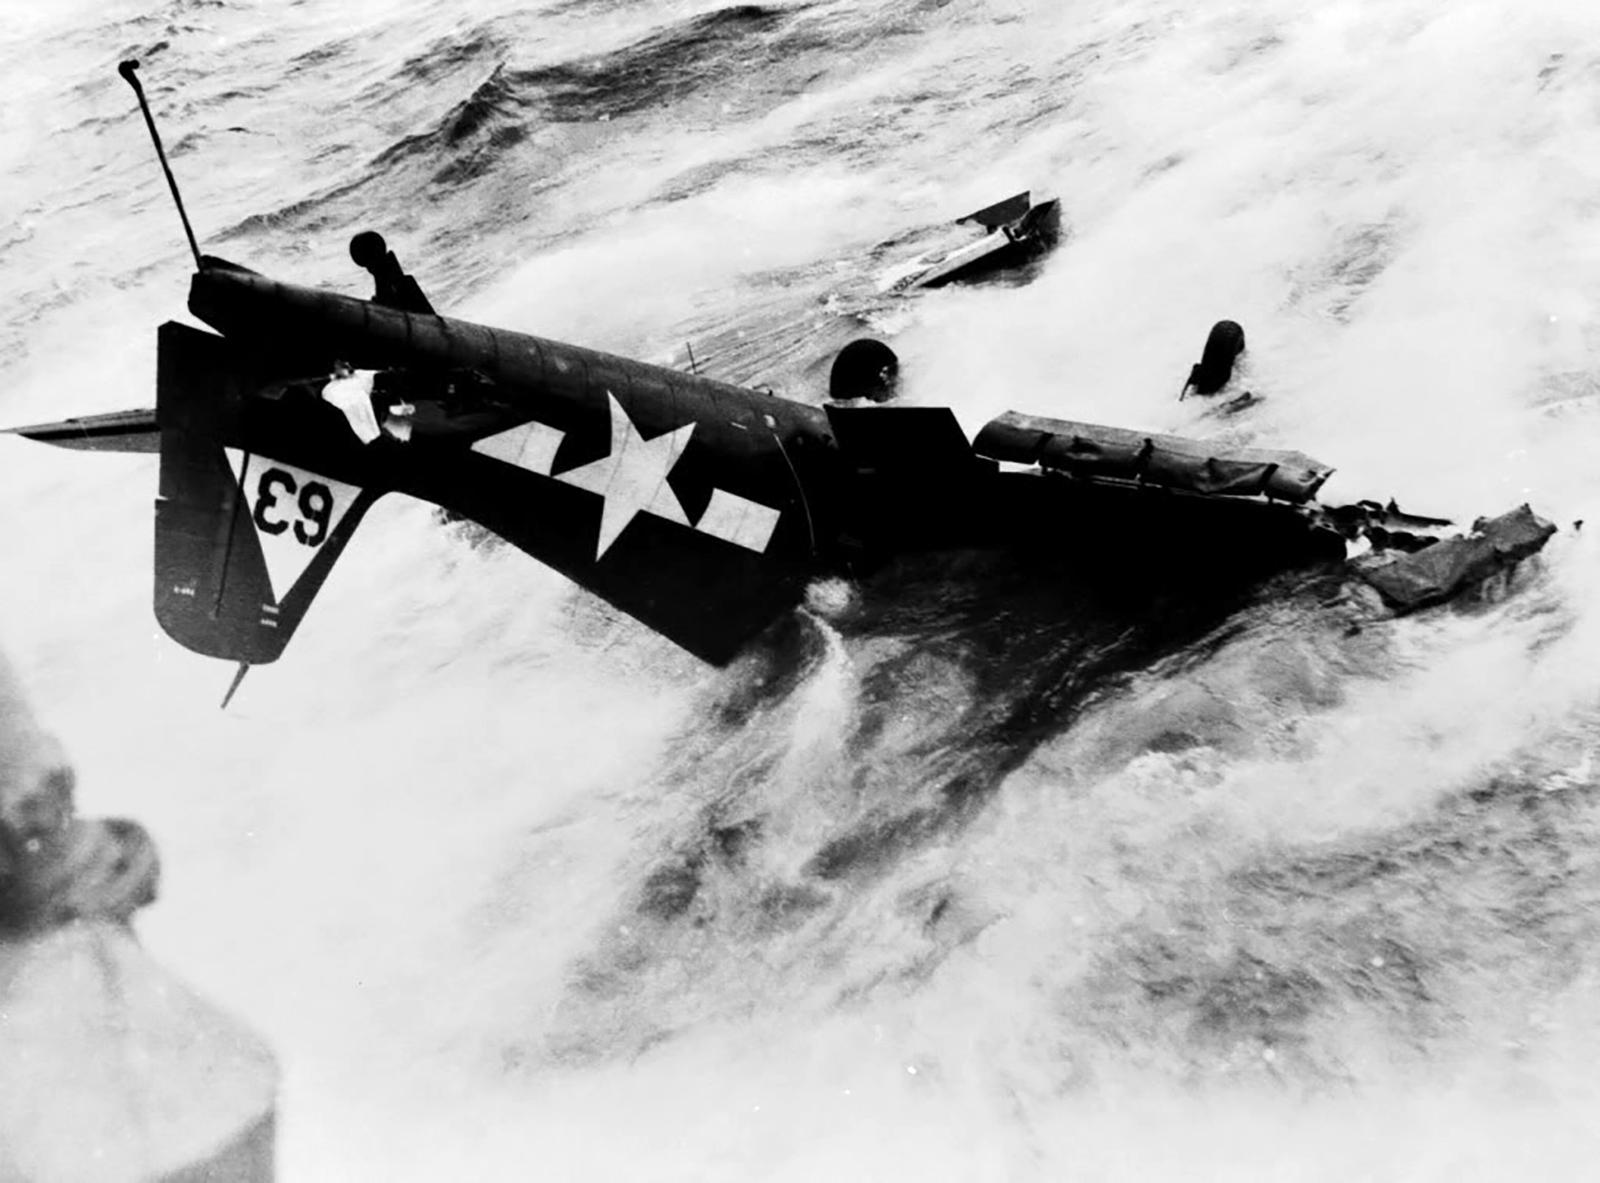 Grumman F6F 5 Hellcat VF 20 White 63 landing mishap USS Enterprise 01